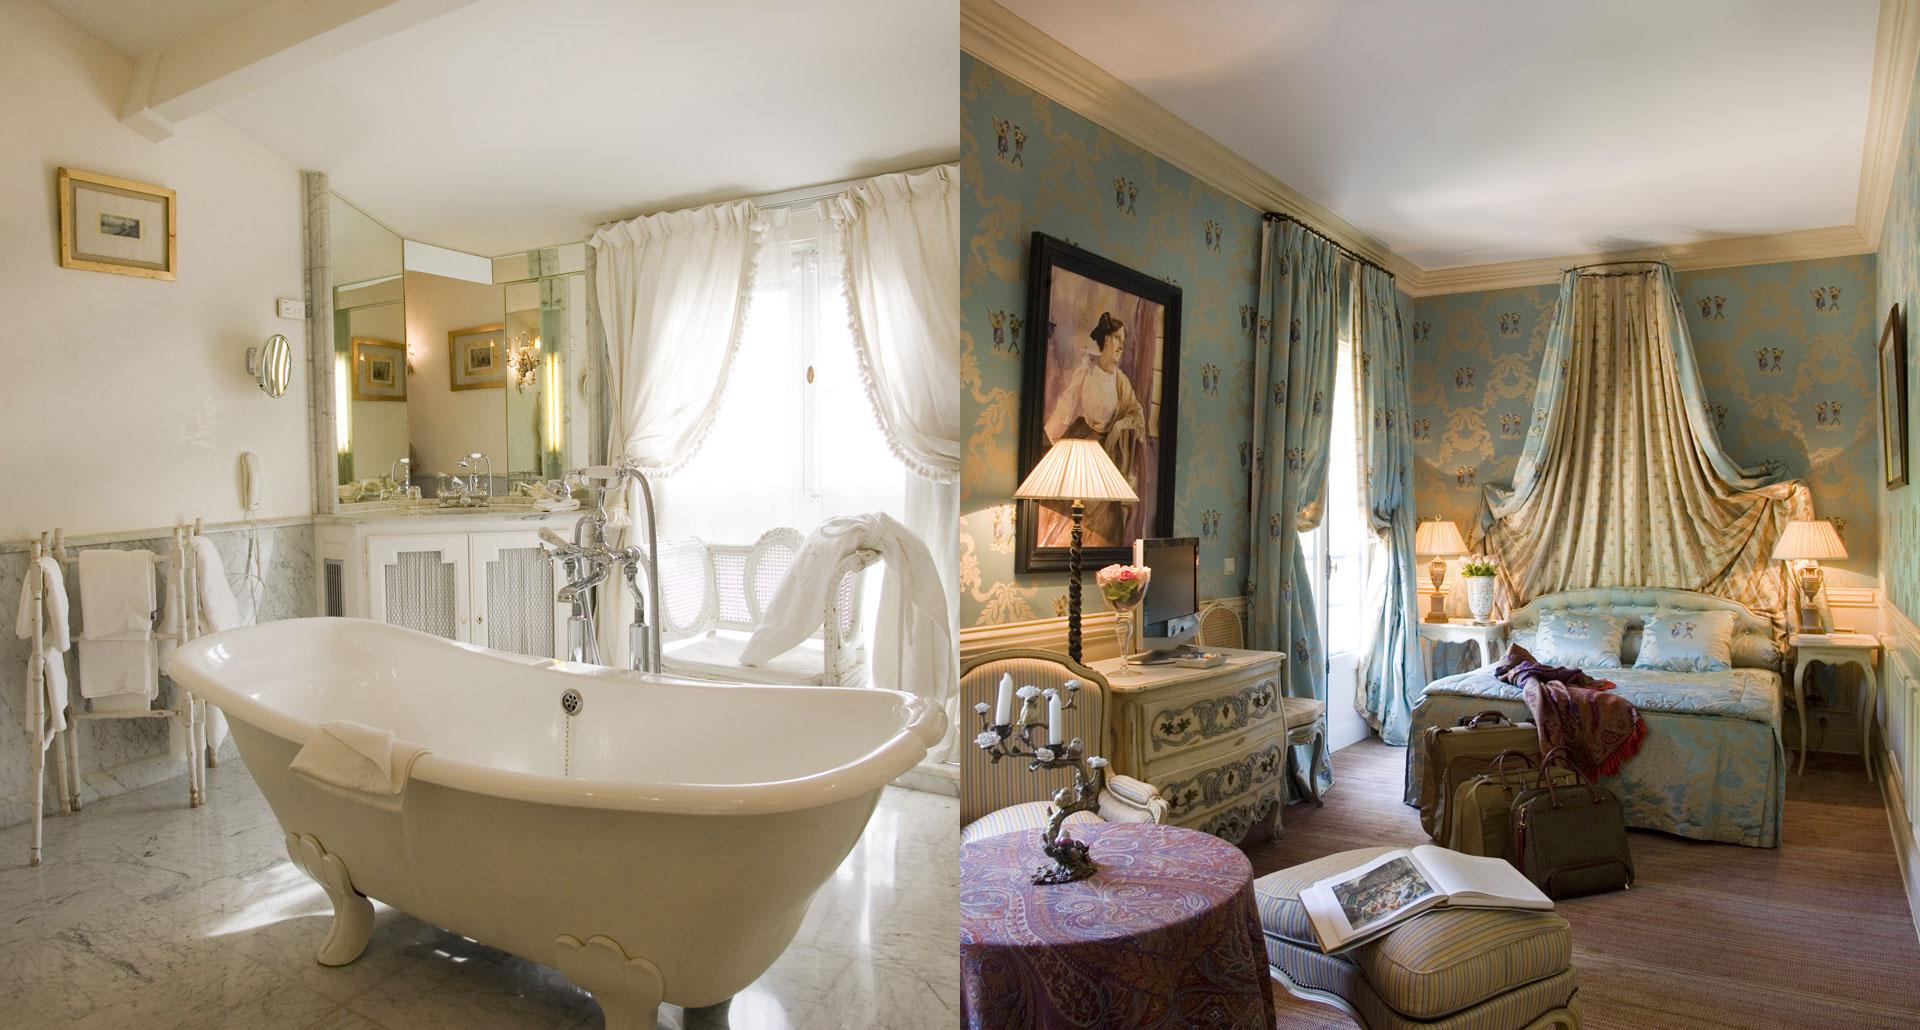 Villa Gallici - romantic boutique hotel in Aix-en-Provence, France